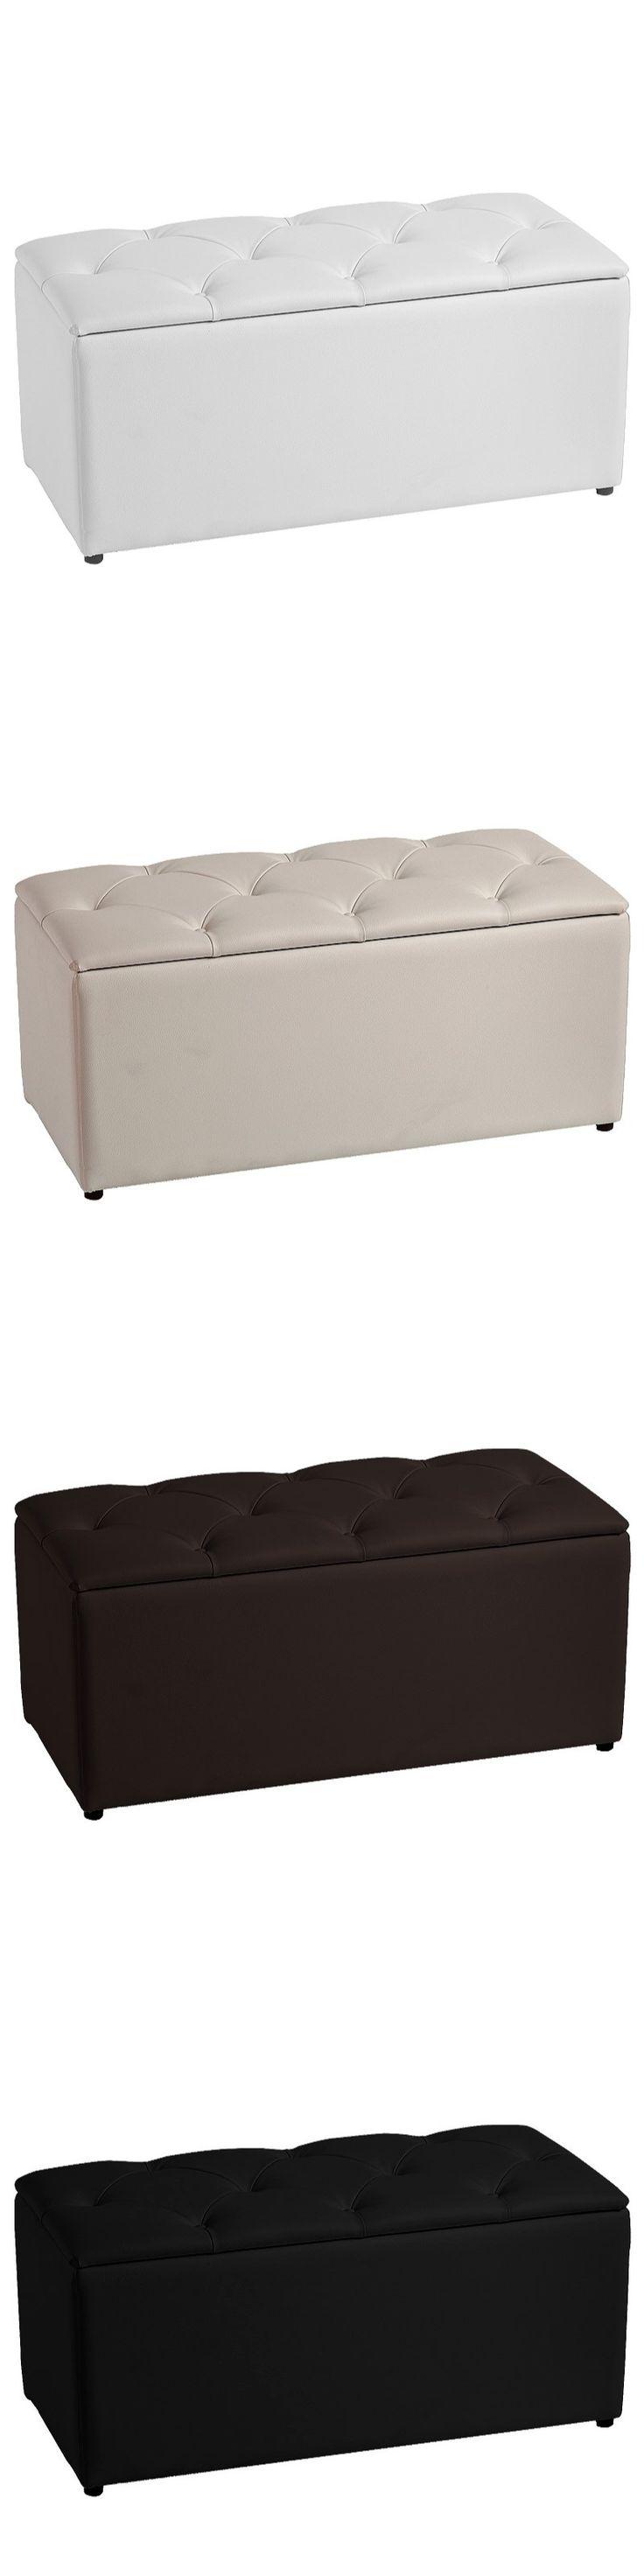 17 mejores ideas sobre baul madera en pinterest baul de for Papel imitacion madera para muebles